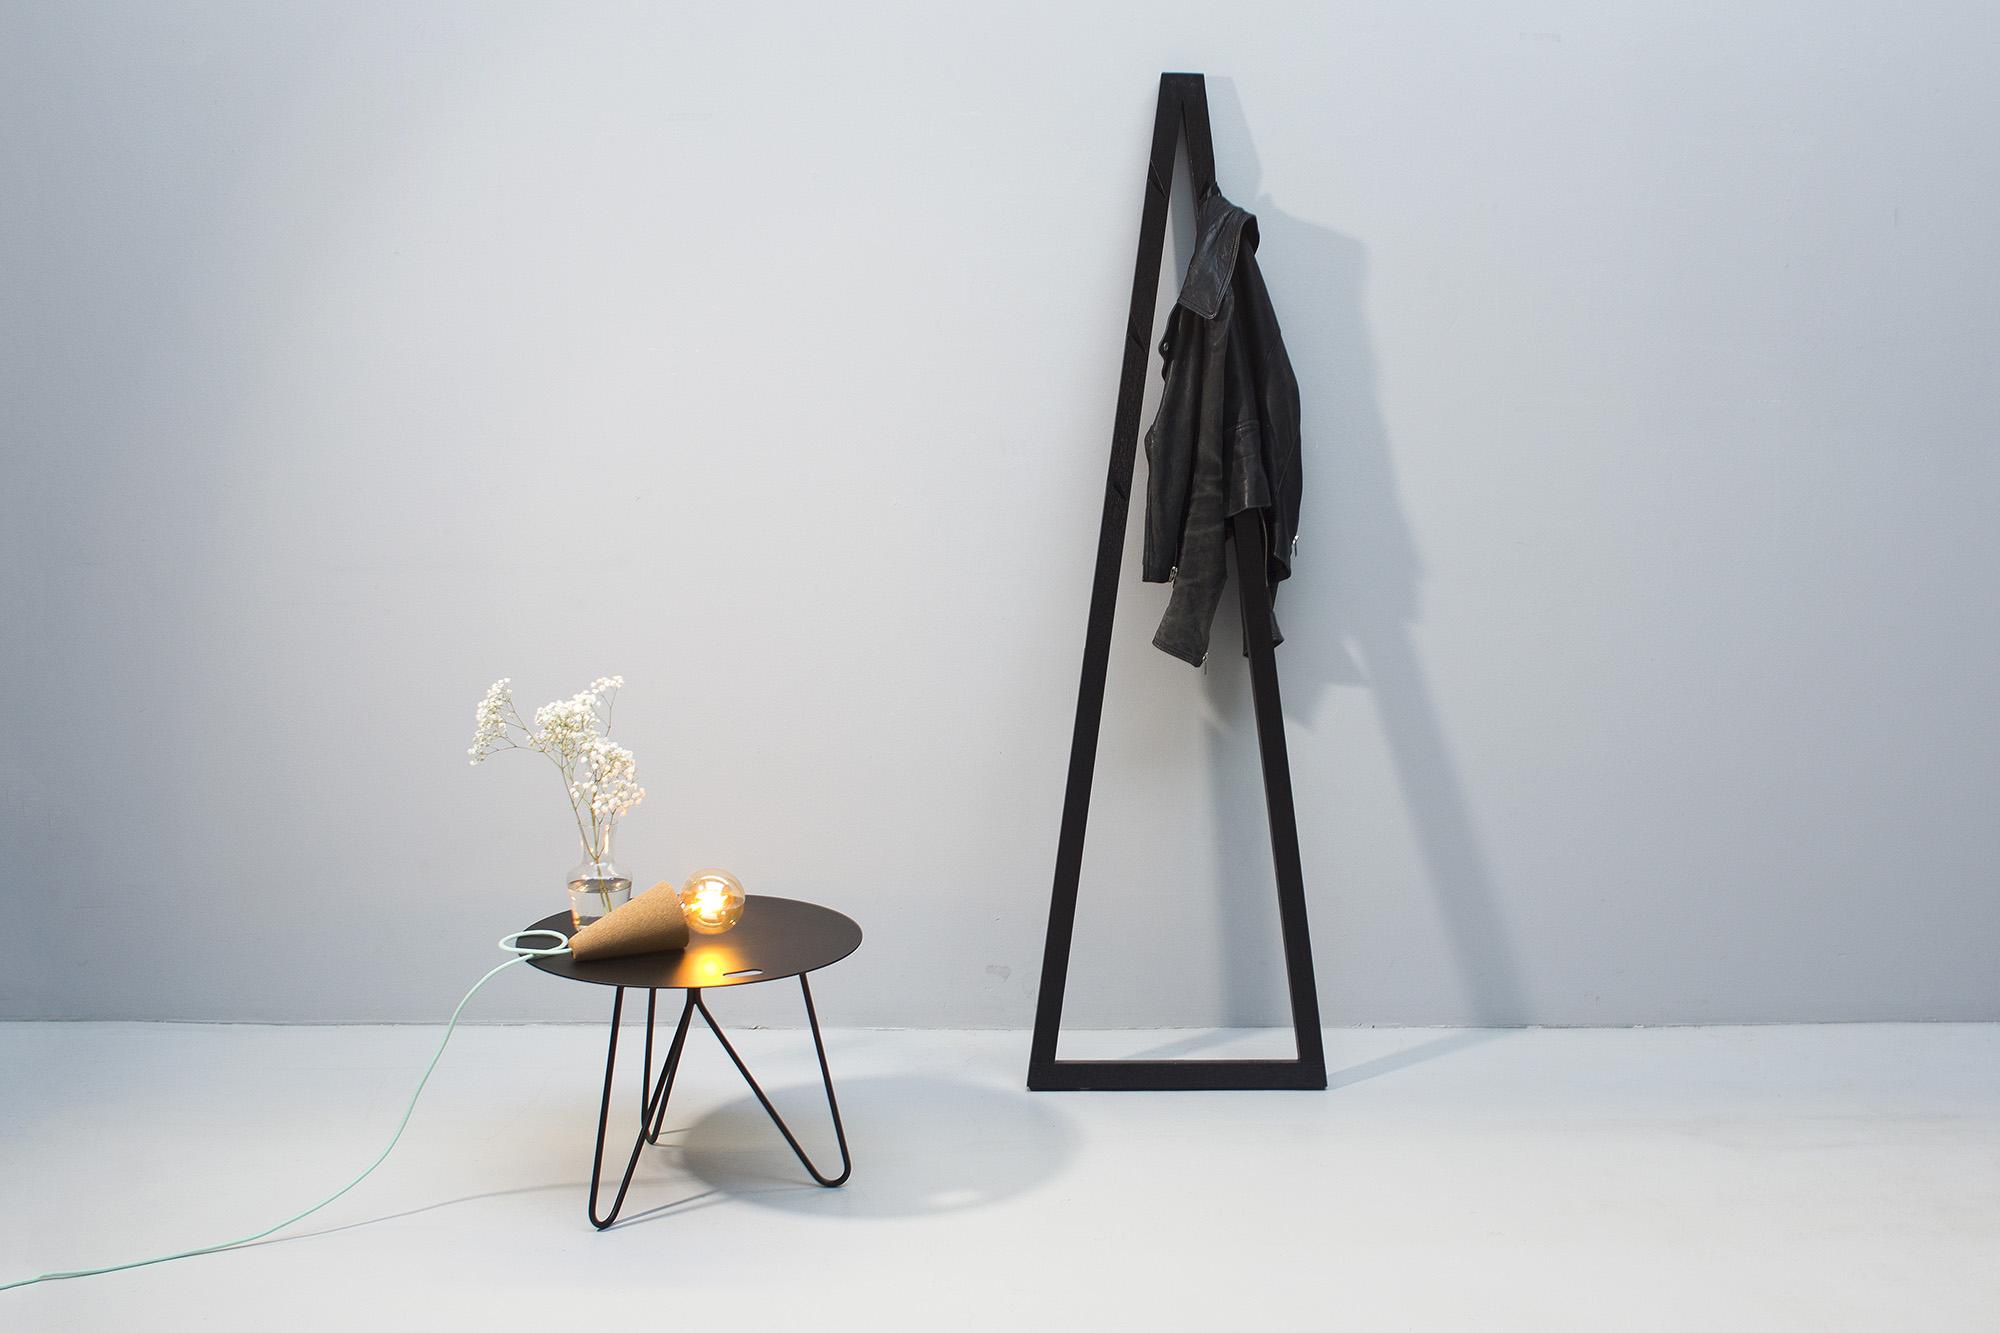 low-Galula-Seis-table-black-amb-10.jpg